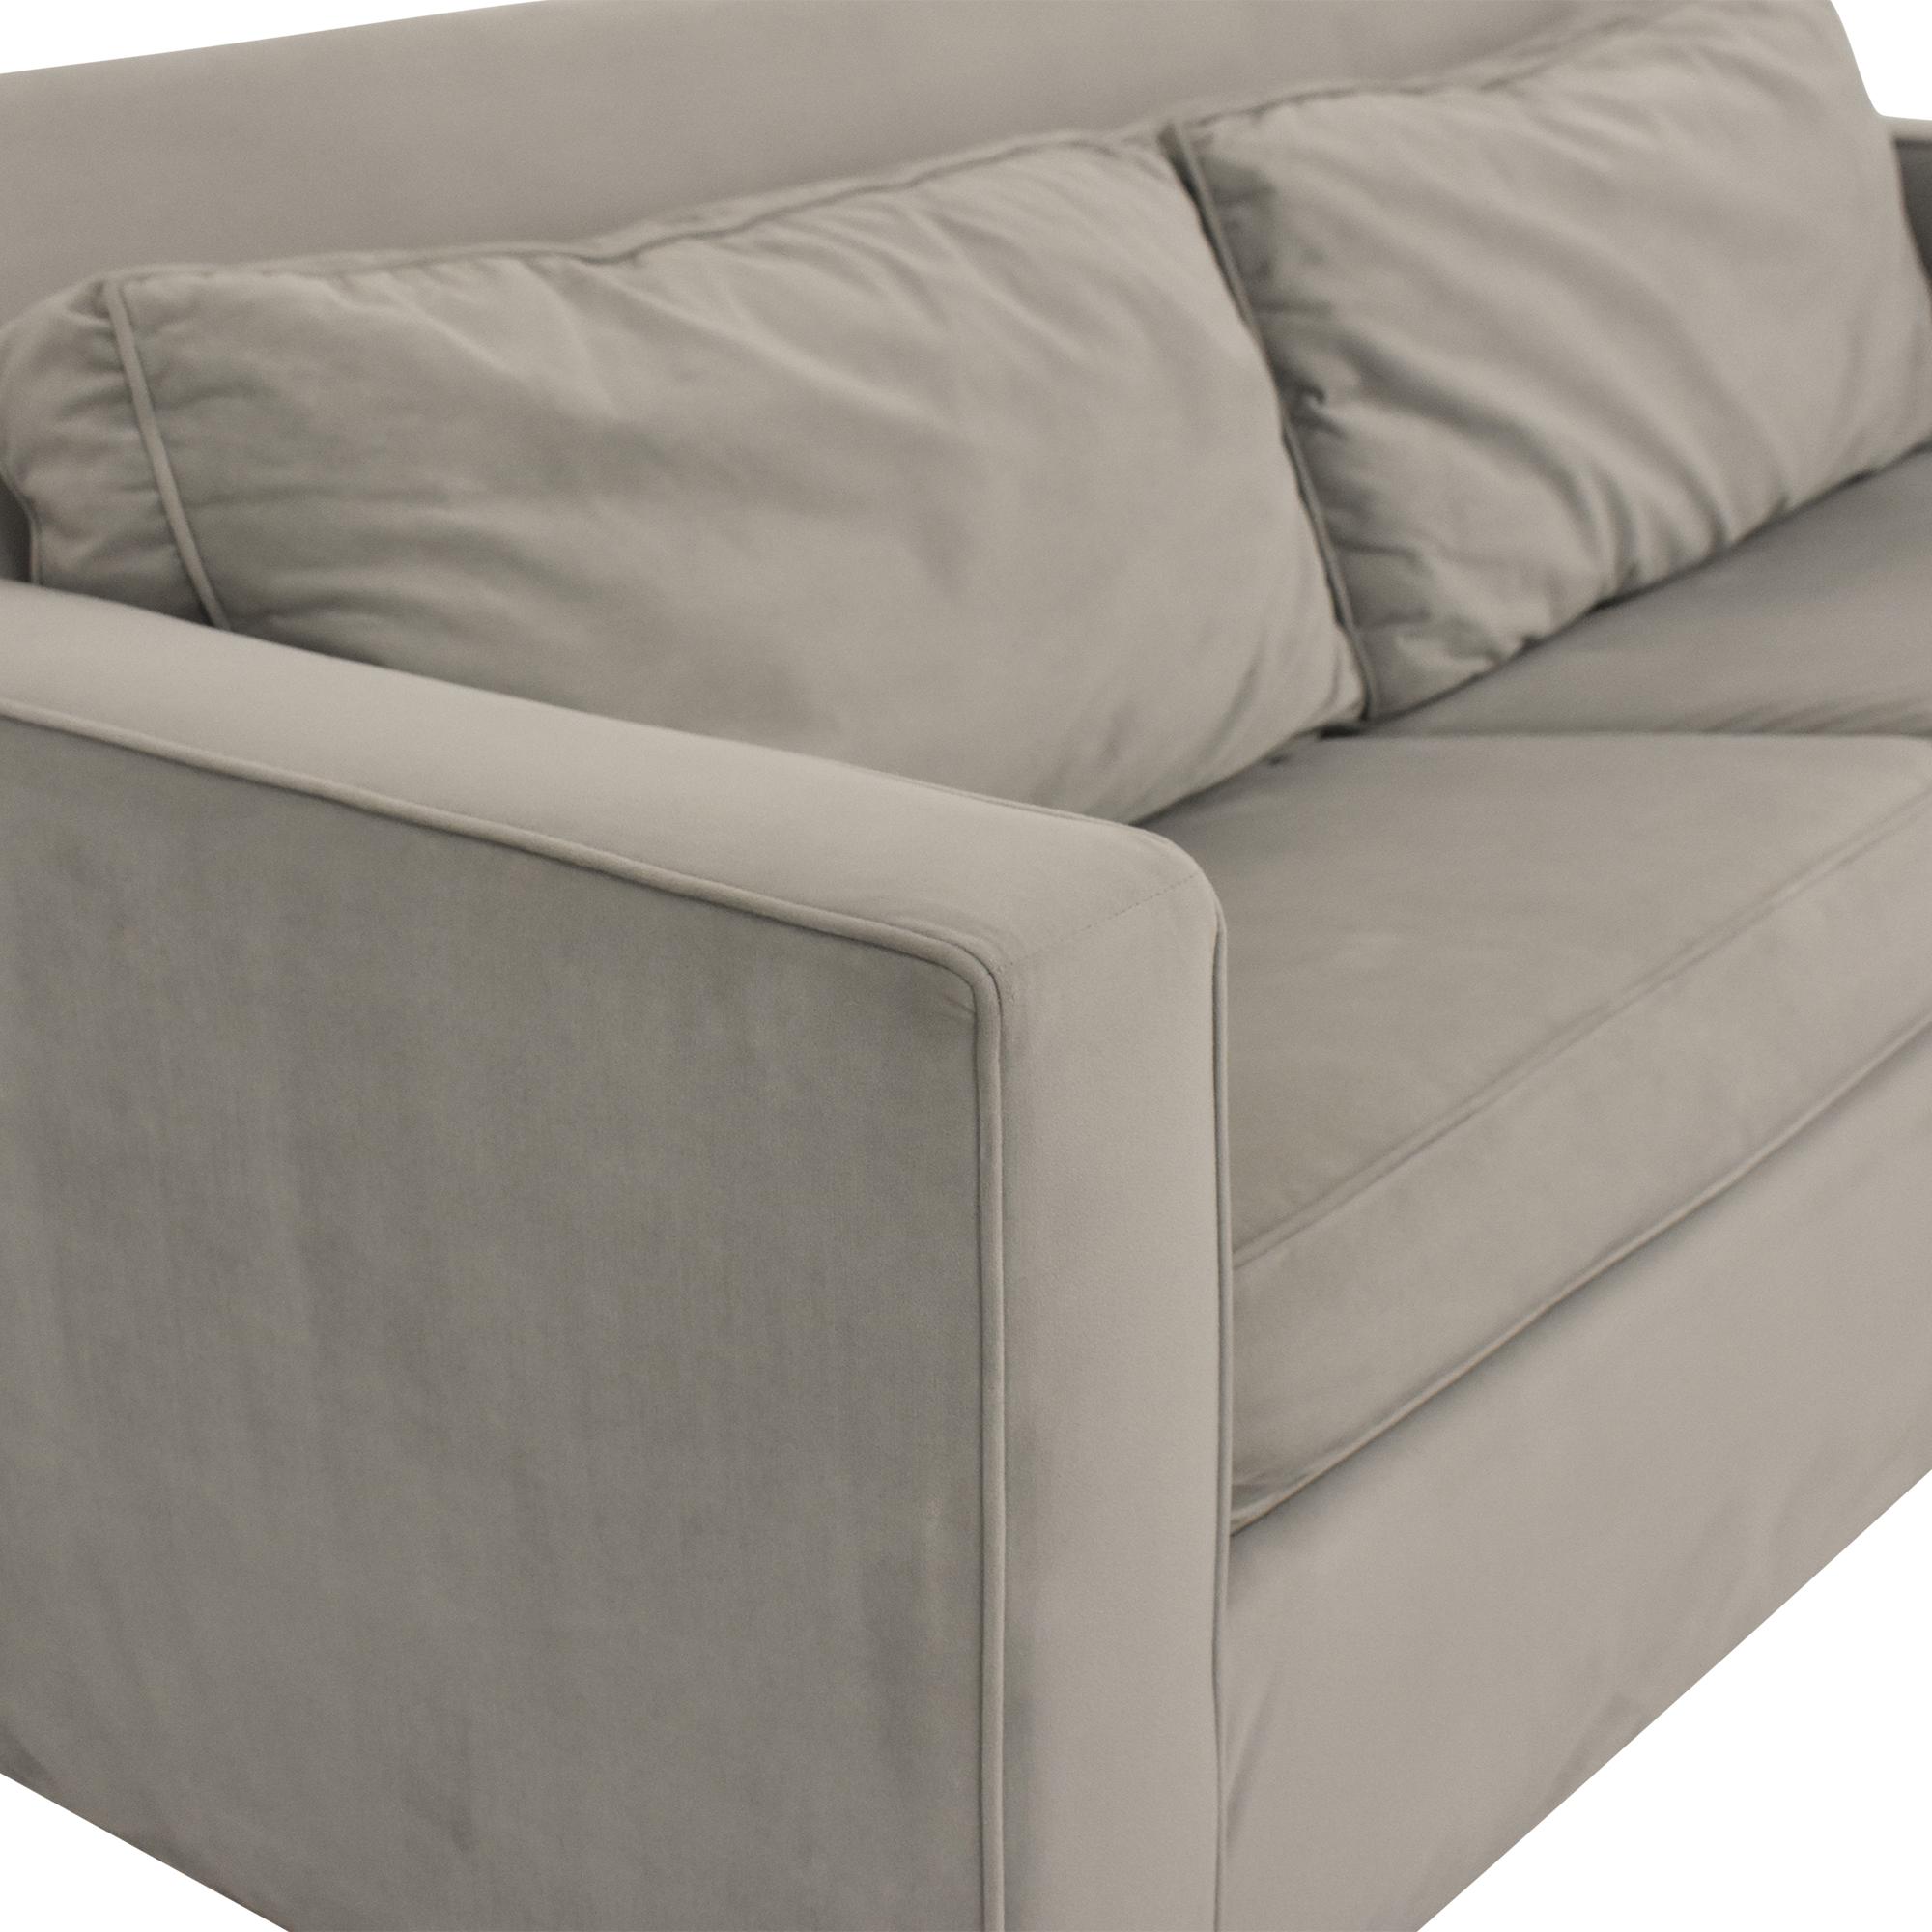 West Elm West Elm Henry Sleeper Sofa price